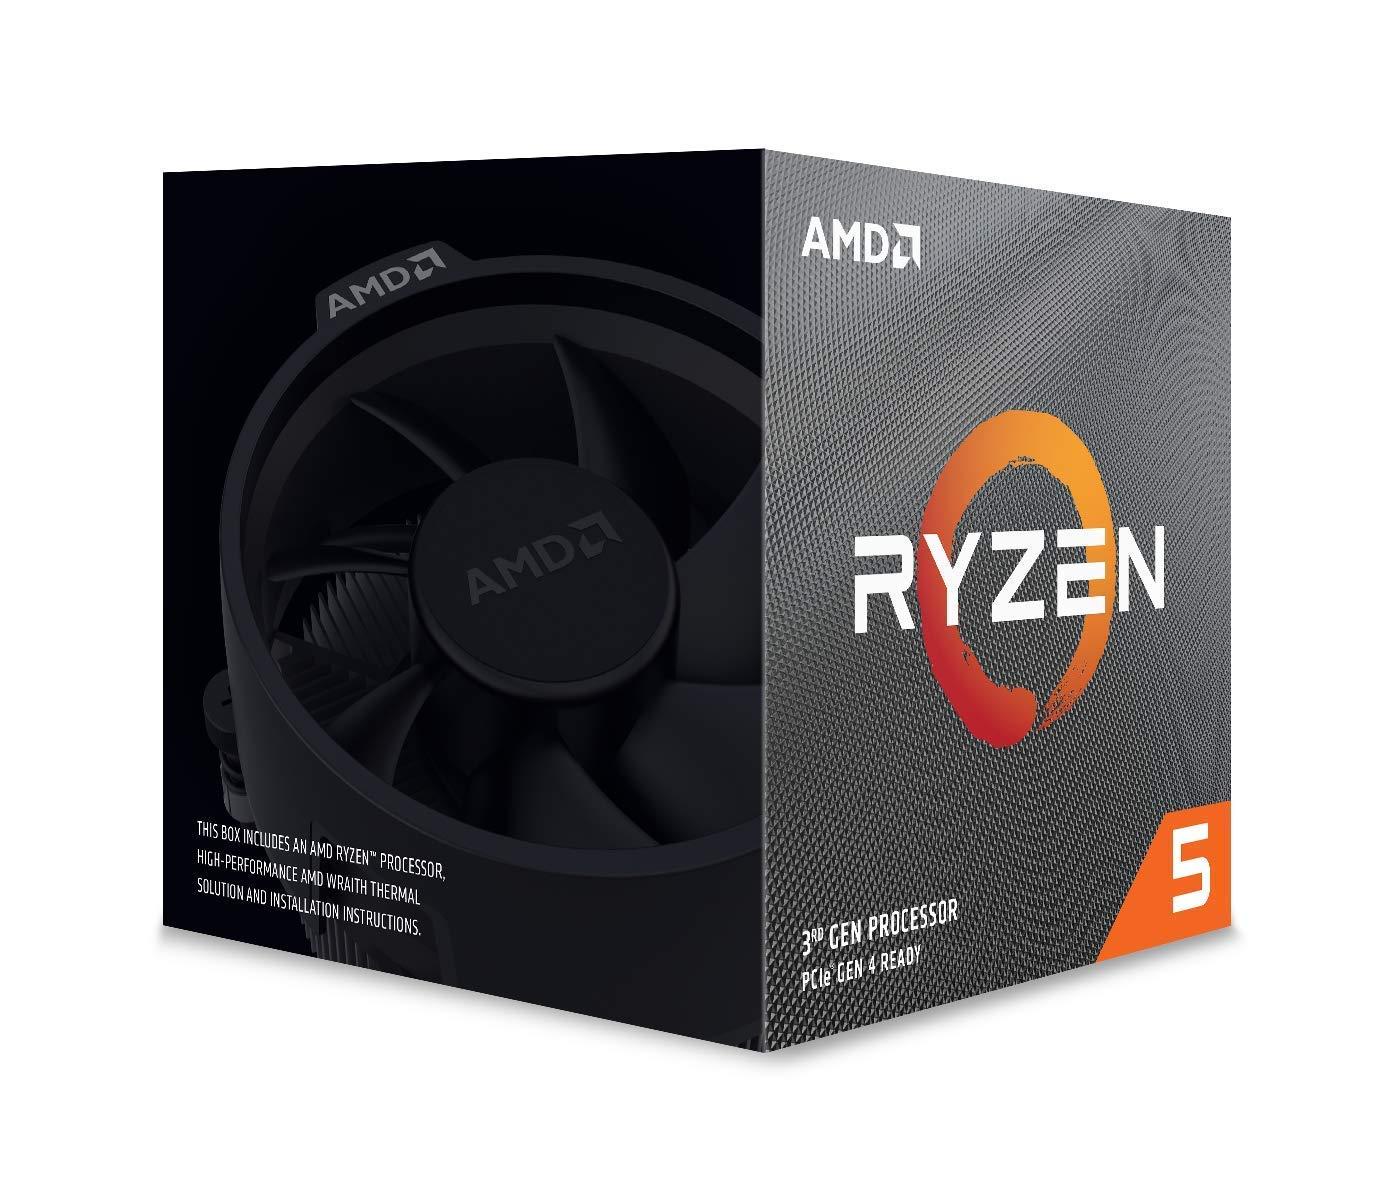 AMD Ryzen 5 3600XT Desktop Processor 6 cores up to 4.5GHz 35MB Cache AM4 Socket (100-100000281BOX)